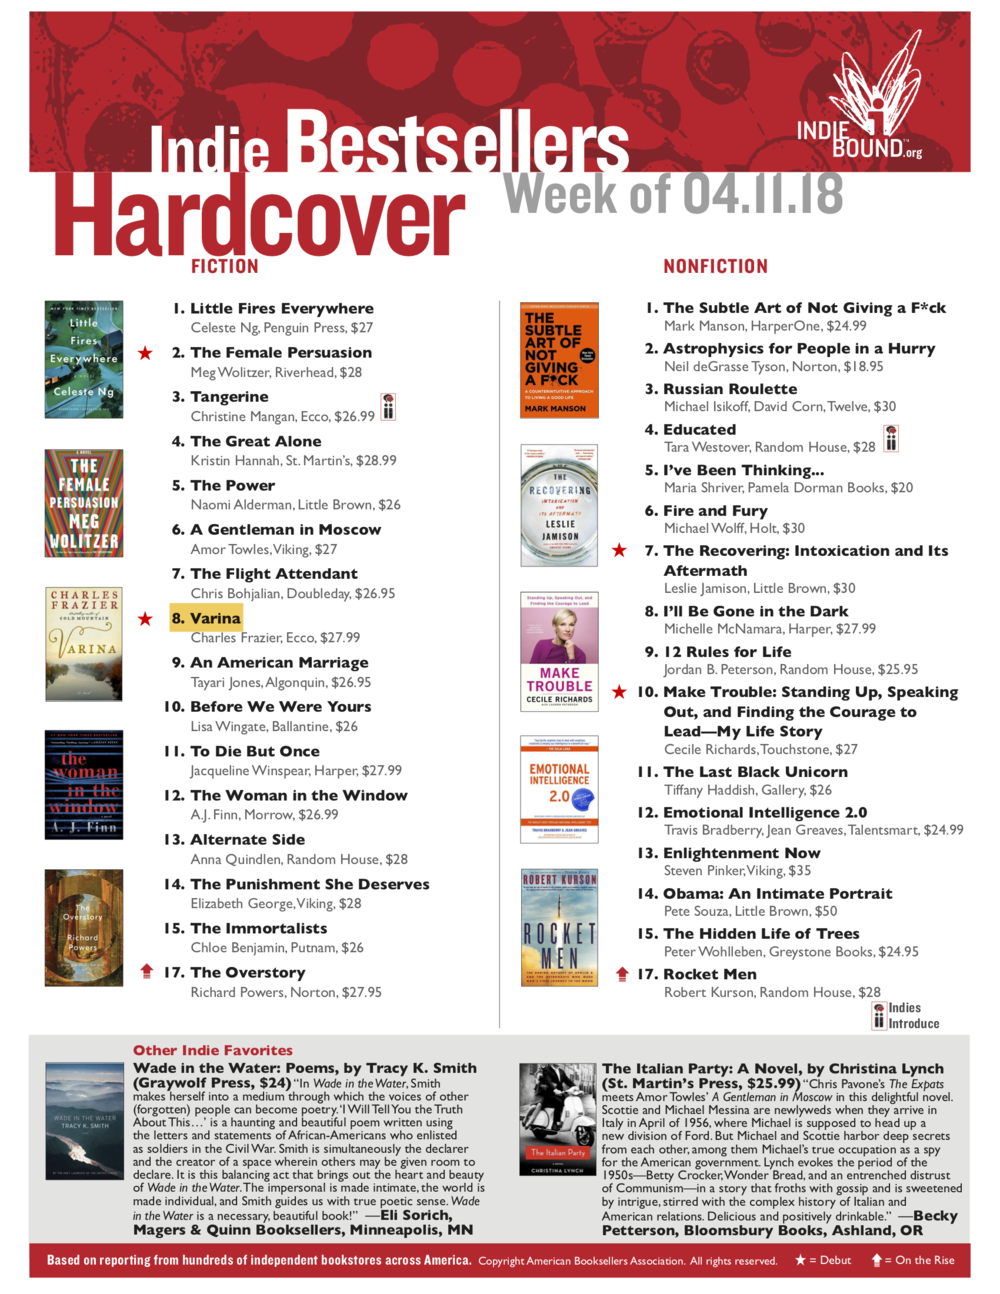 IndieBestsellers4.11.18.png